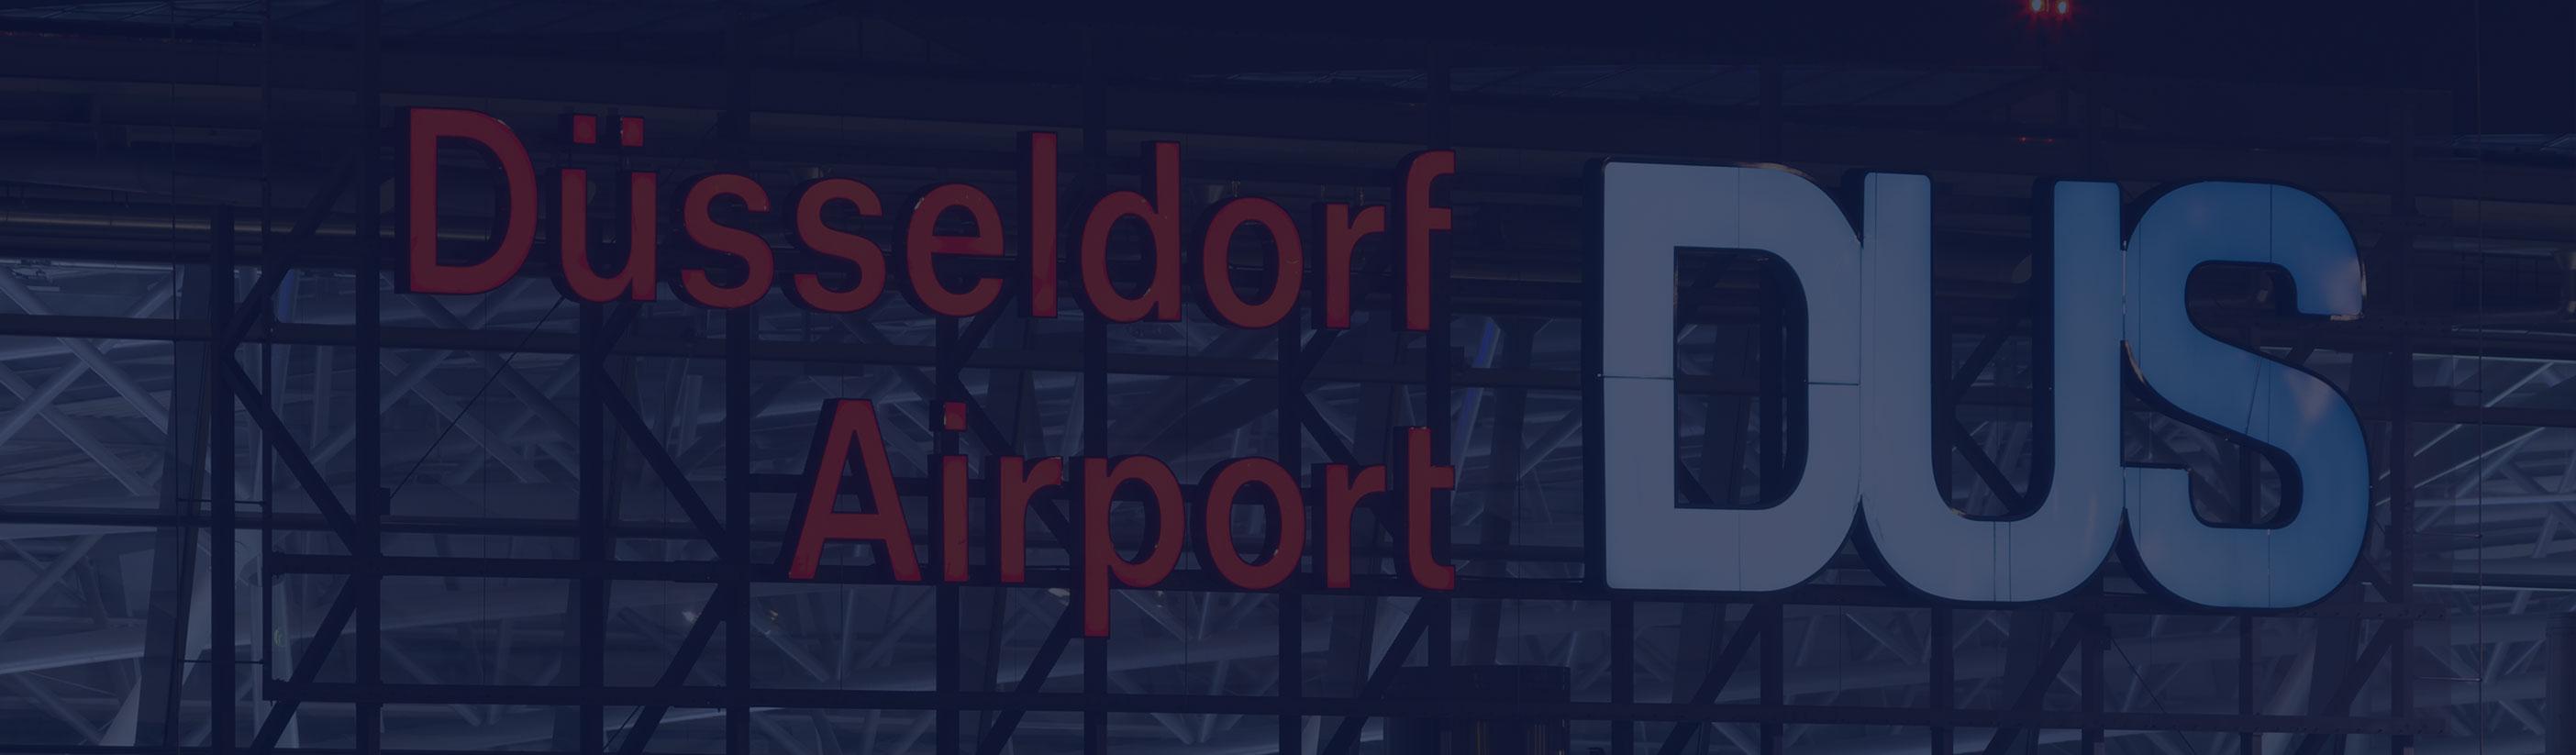 Düsseldorf Airport Declared Capacity Study